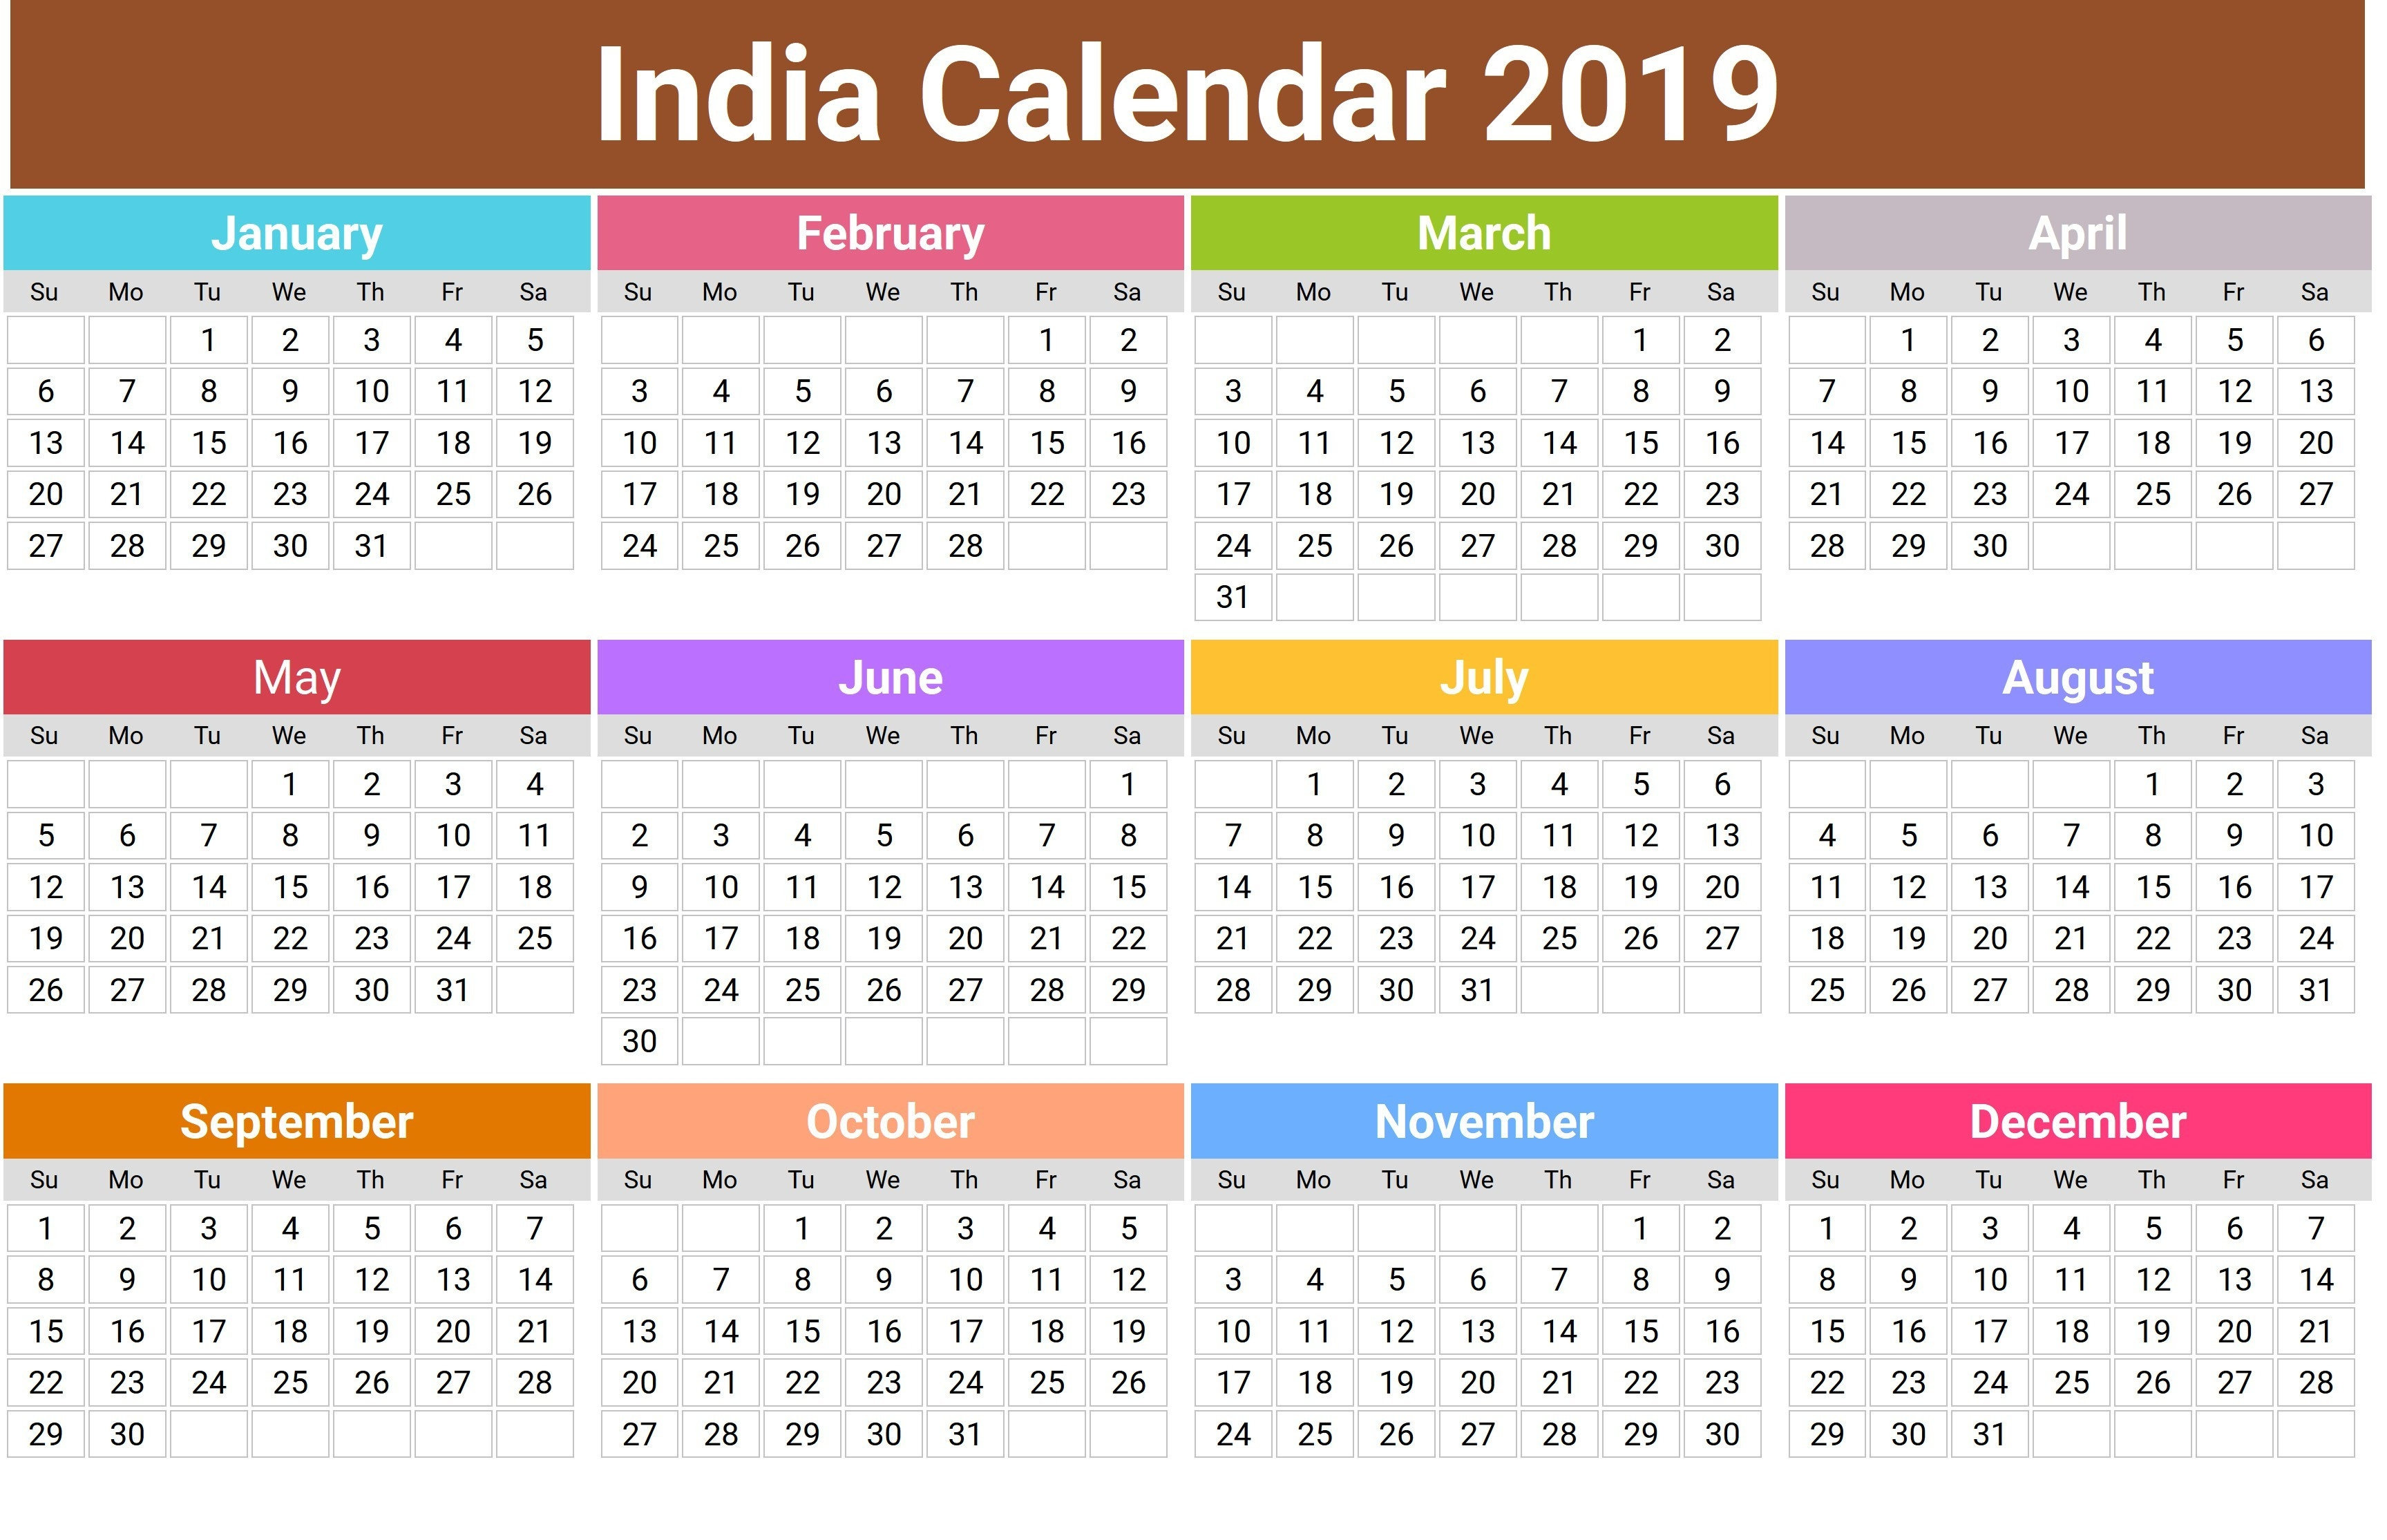 2019 Hindu Calendar With Tithi | Tyohar, Holidays, Festivals-January 2020 Hindu Calendar